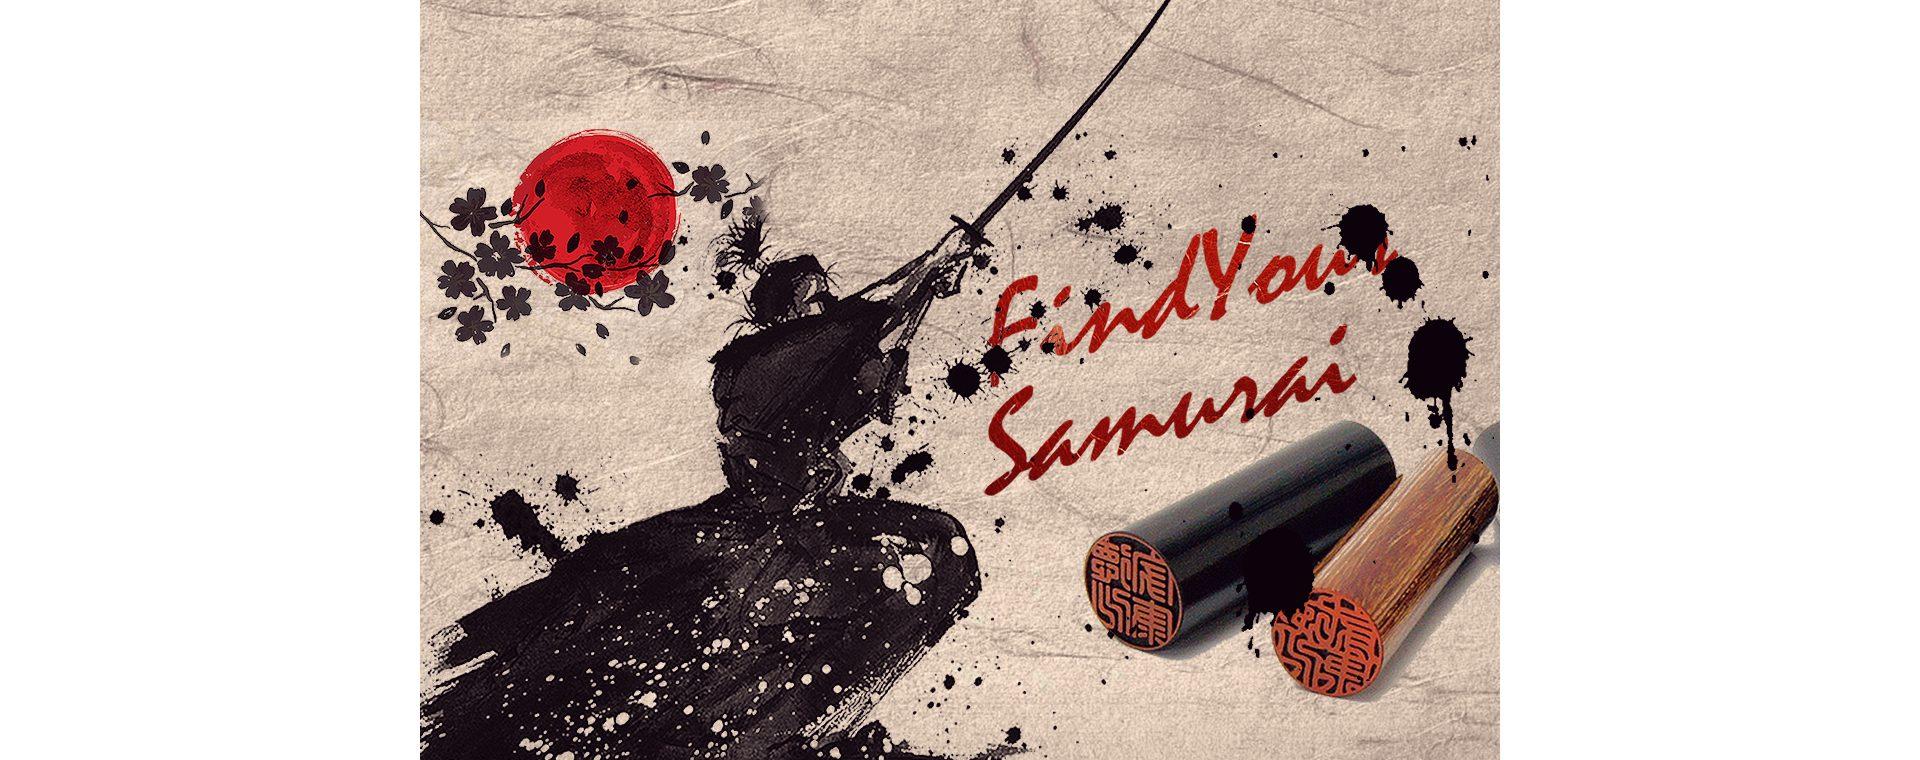 Samurai Hanko